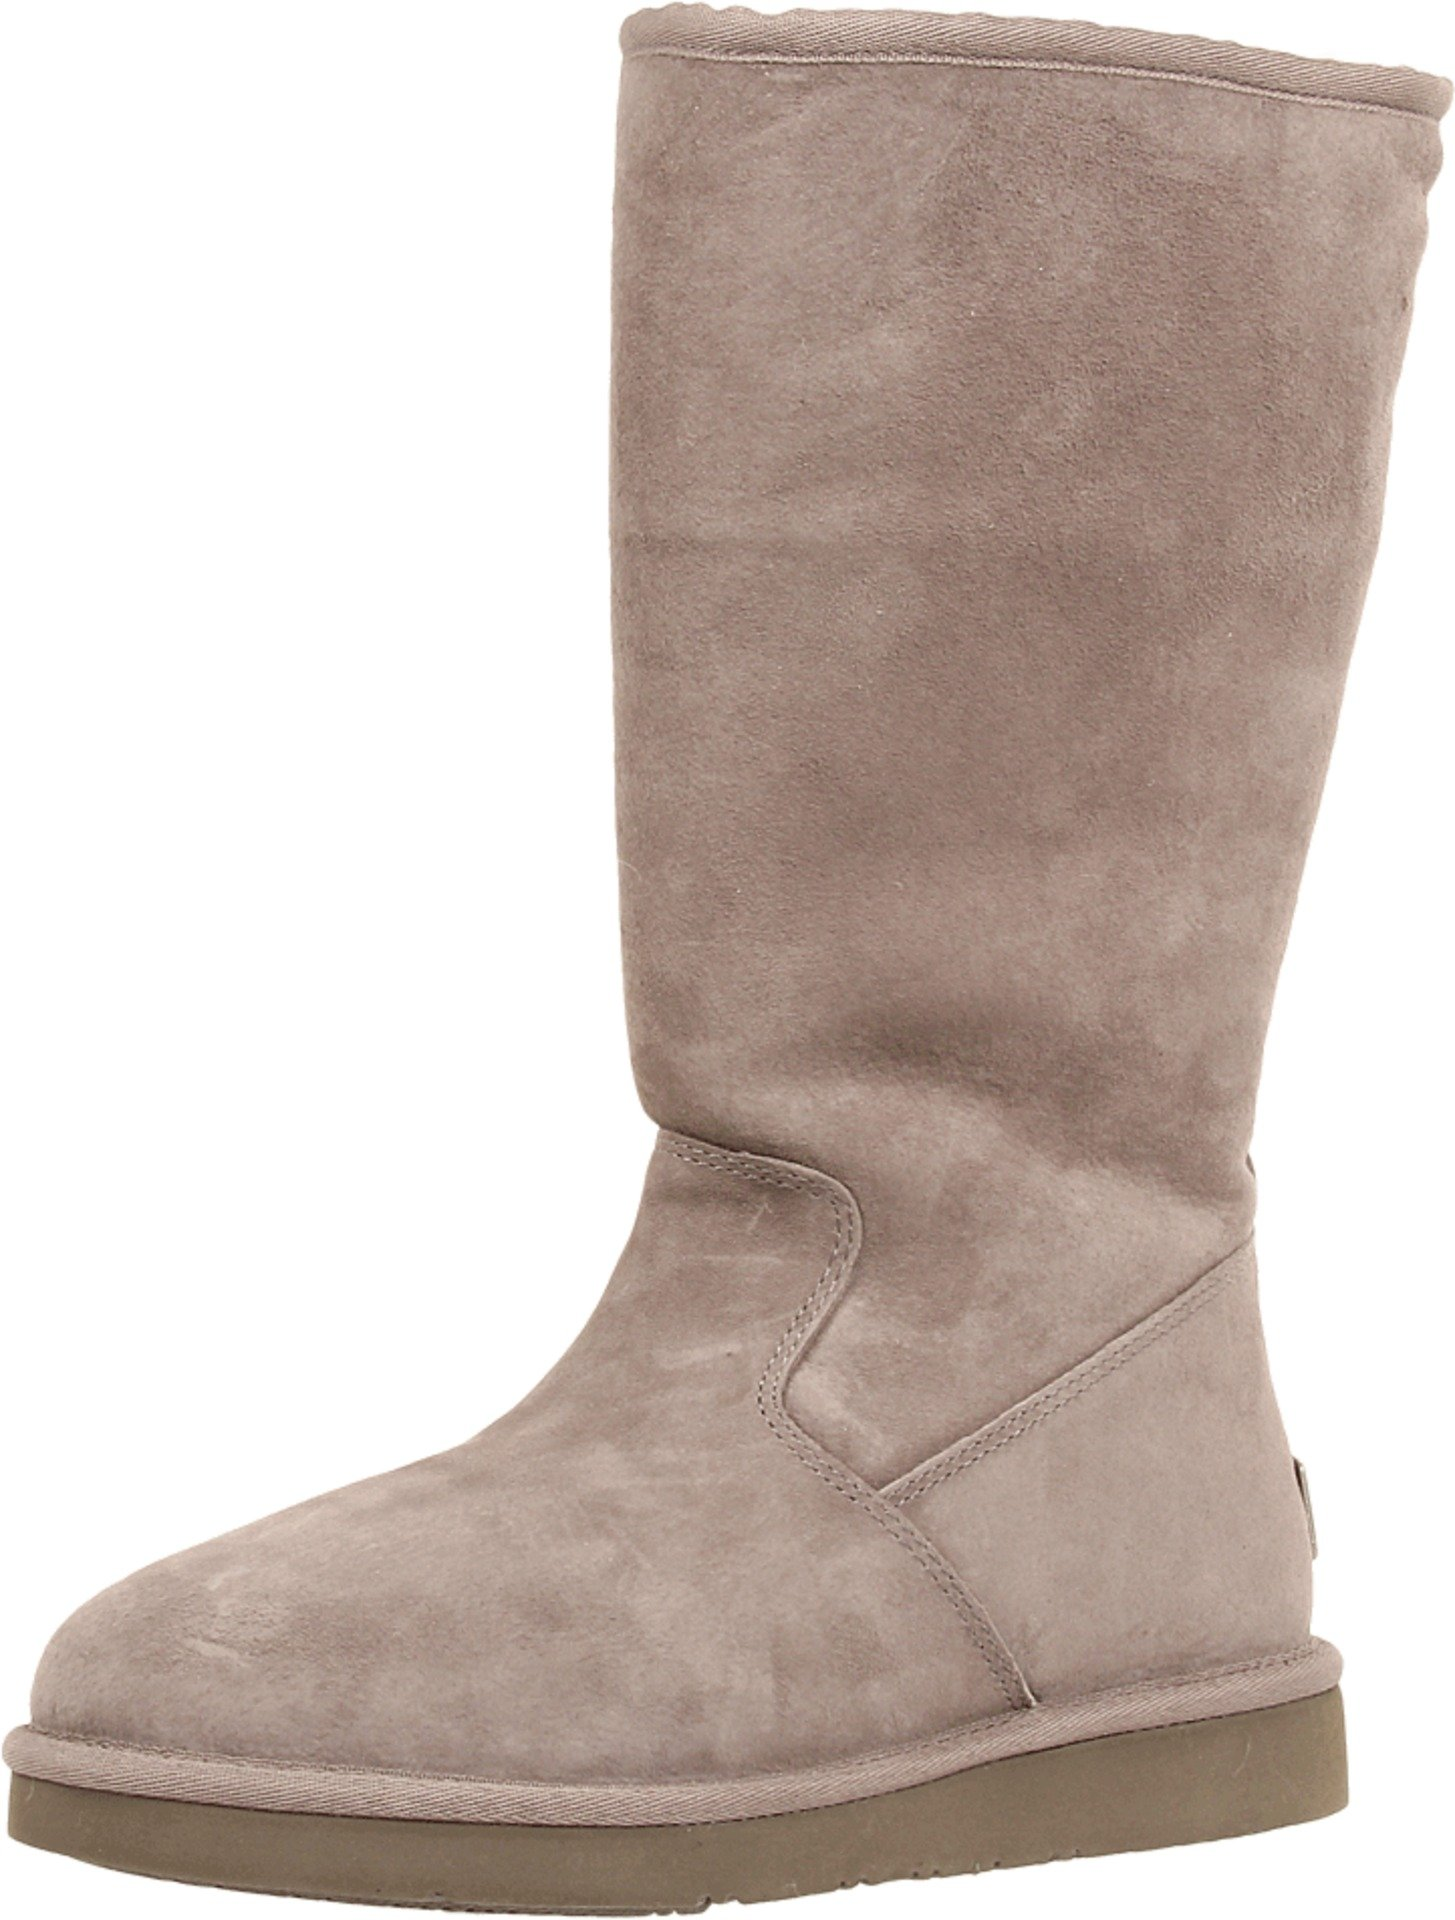 UGG Australia Womens Summer Boot Grey Size 5